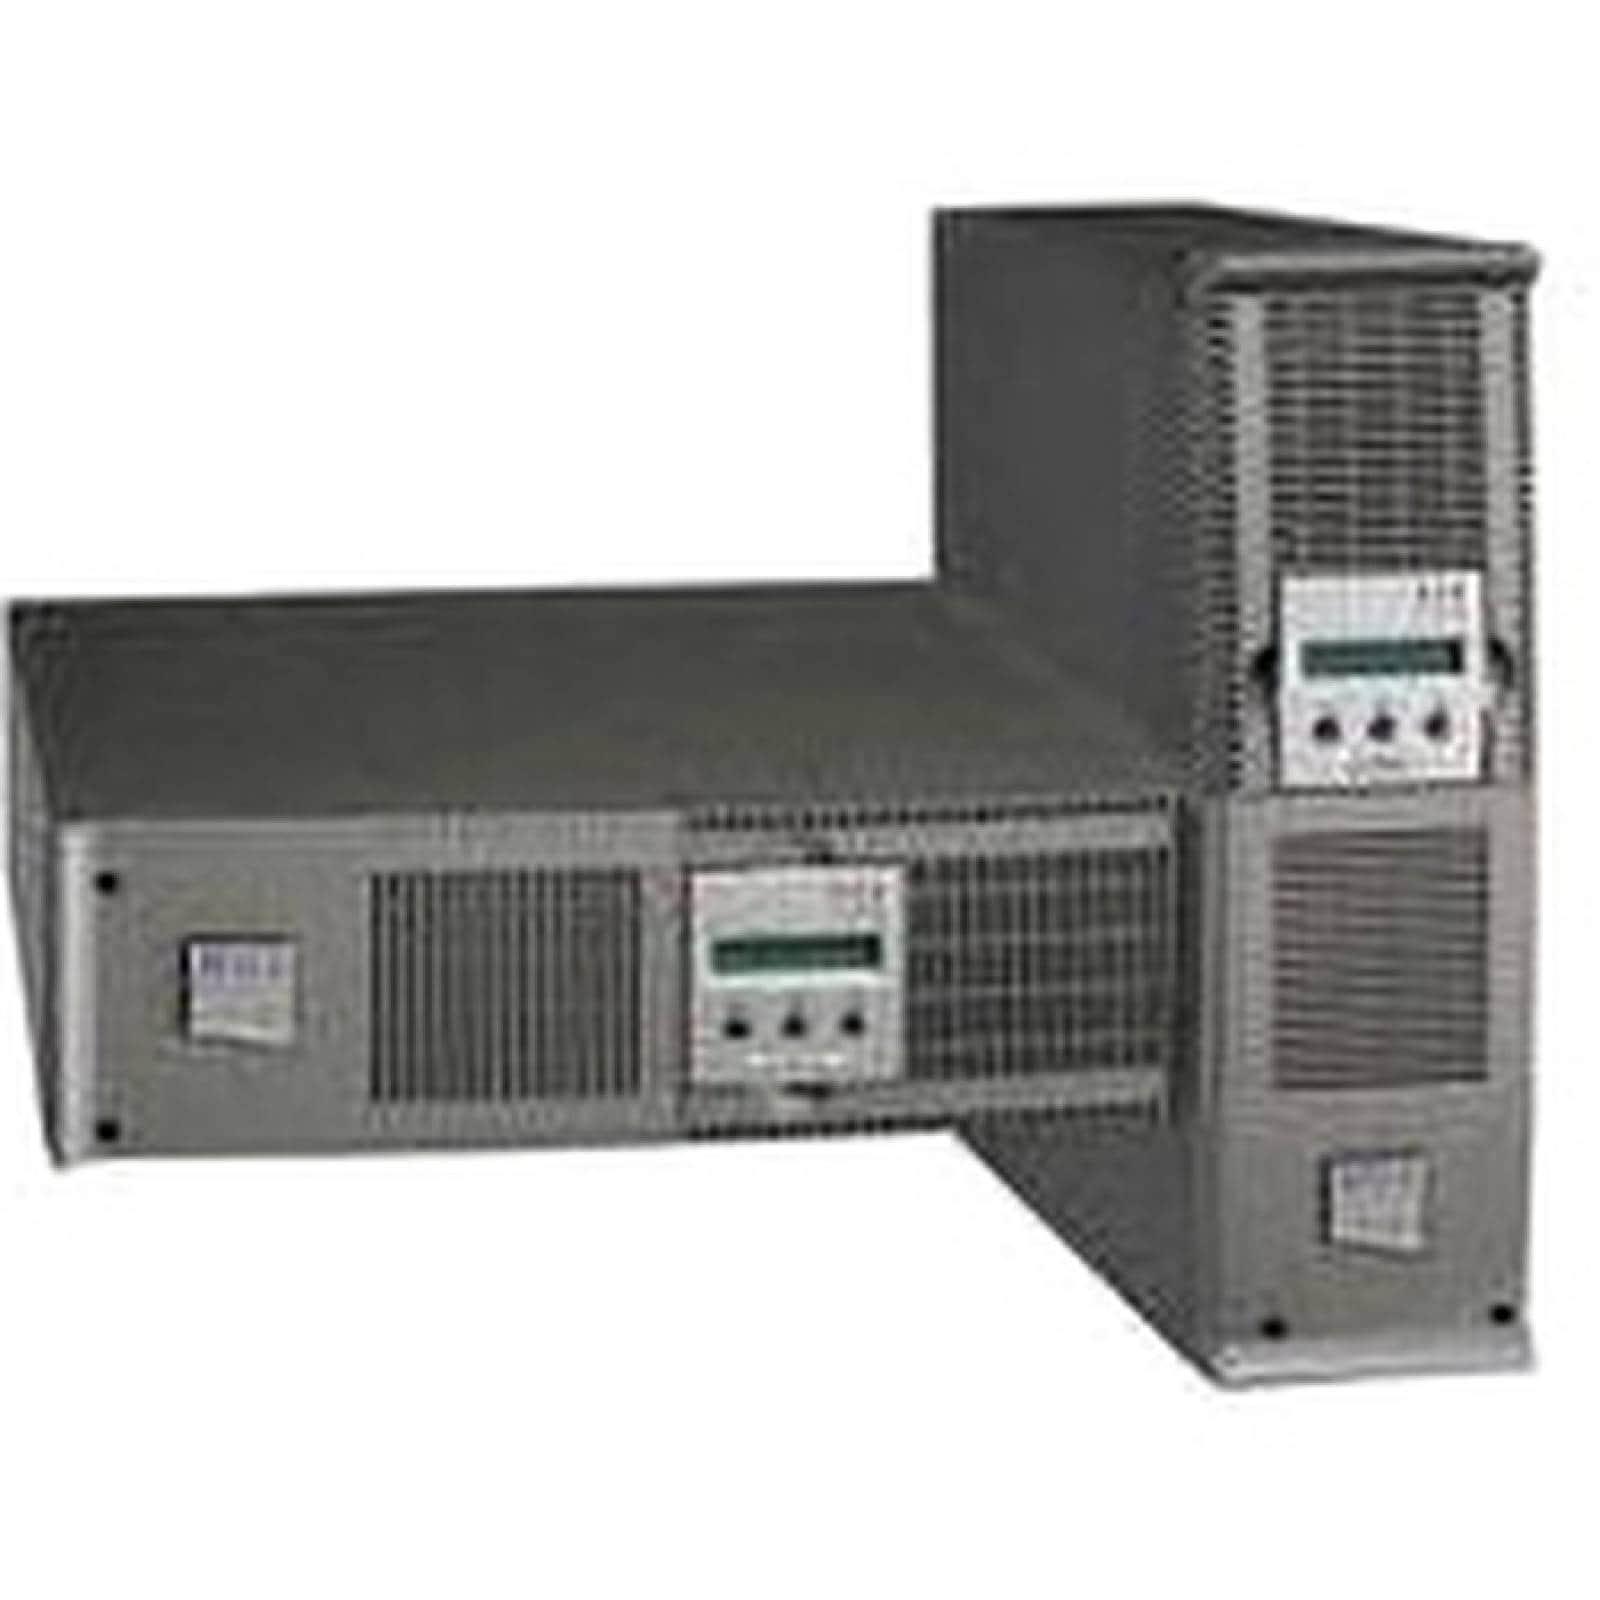 Eaton External 125 A Interruptor de bypass de mantenimiento